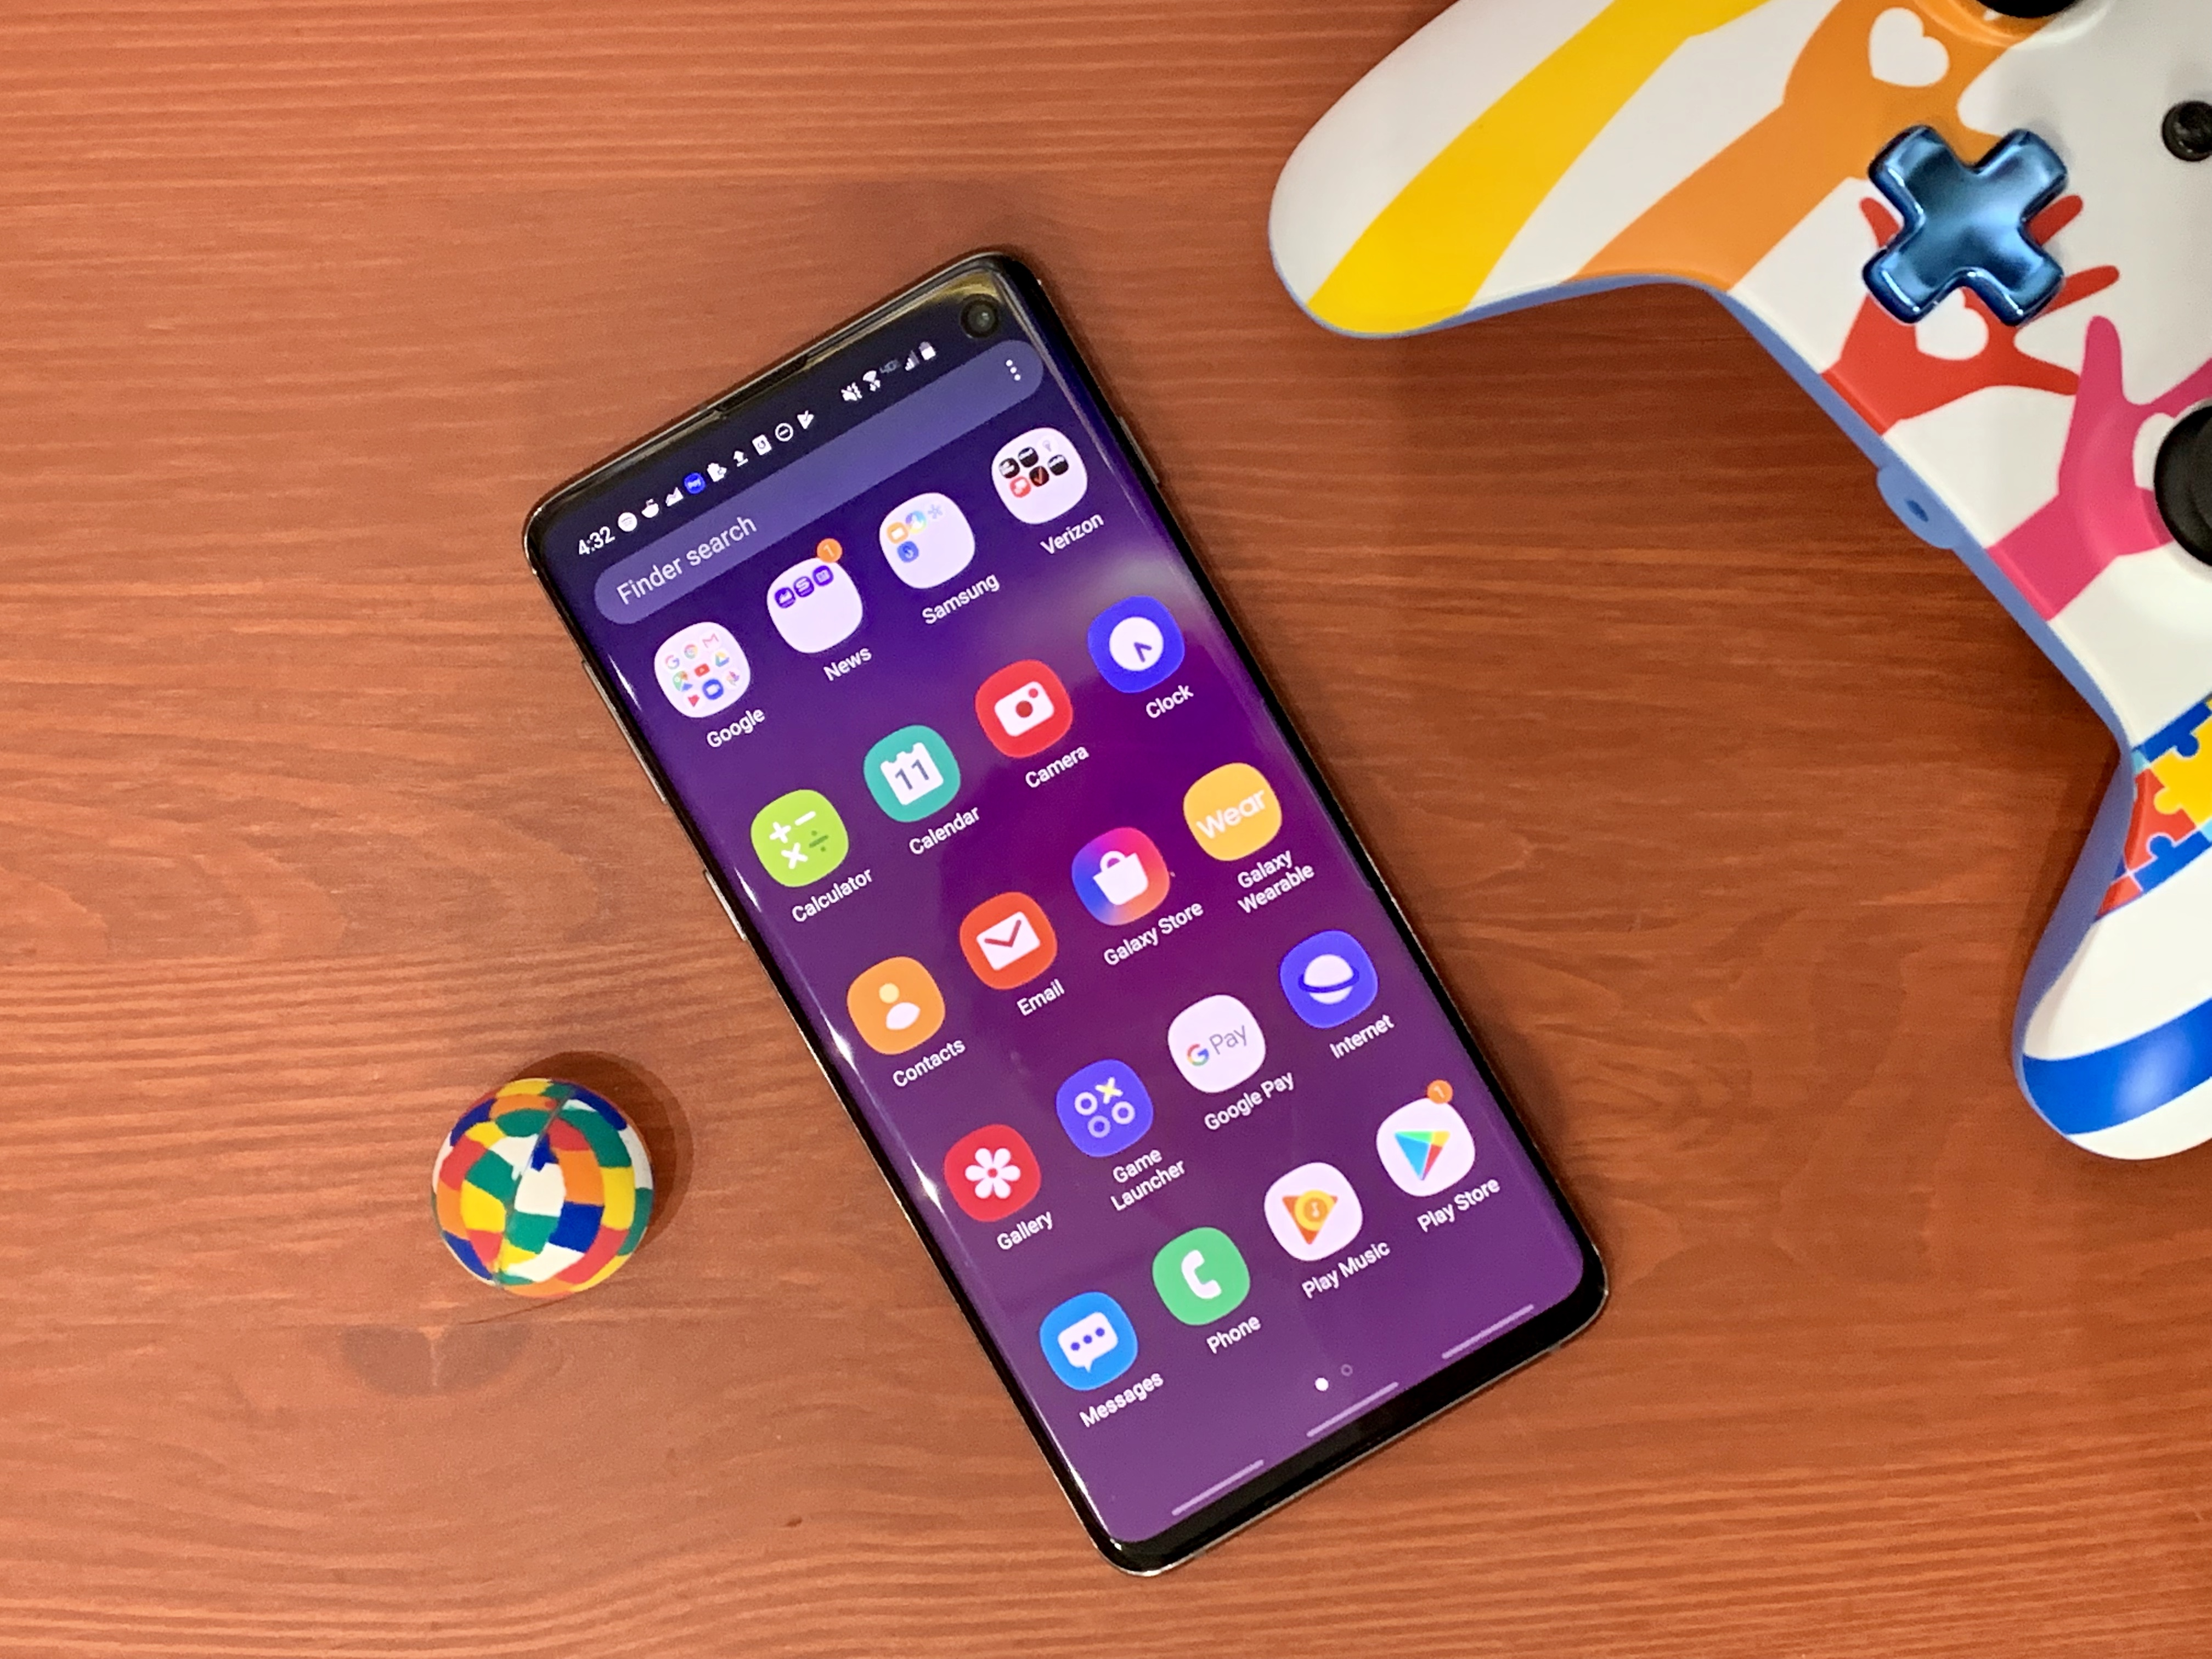 Samsung Galaxy A8 Star - Tech Specifications